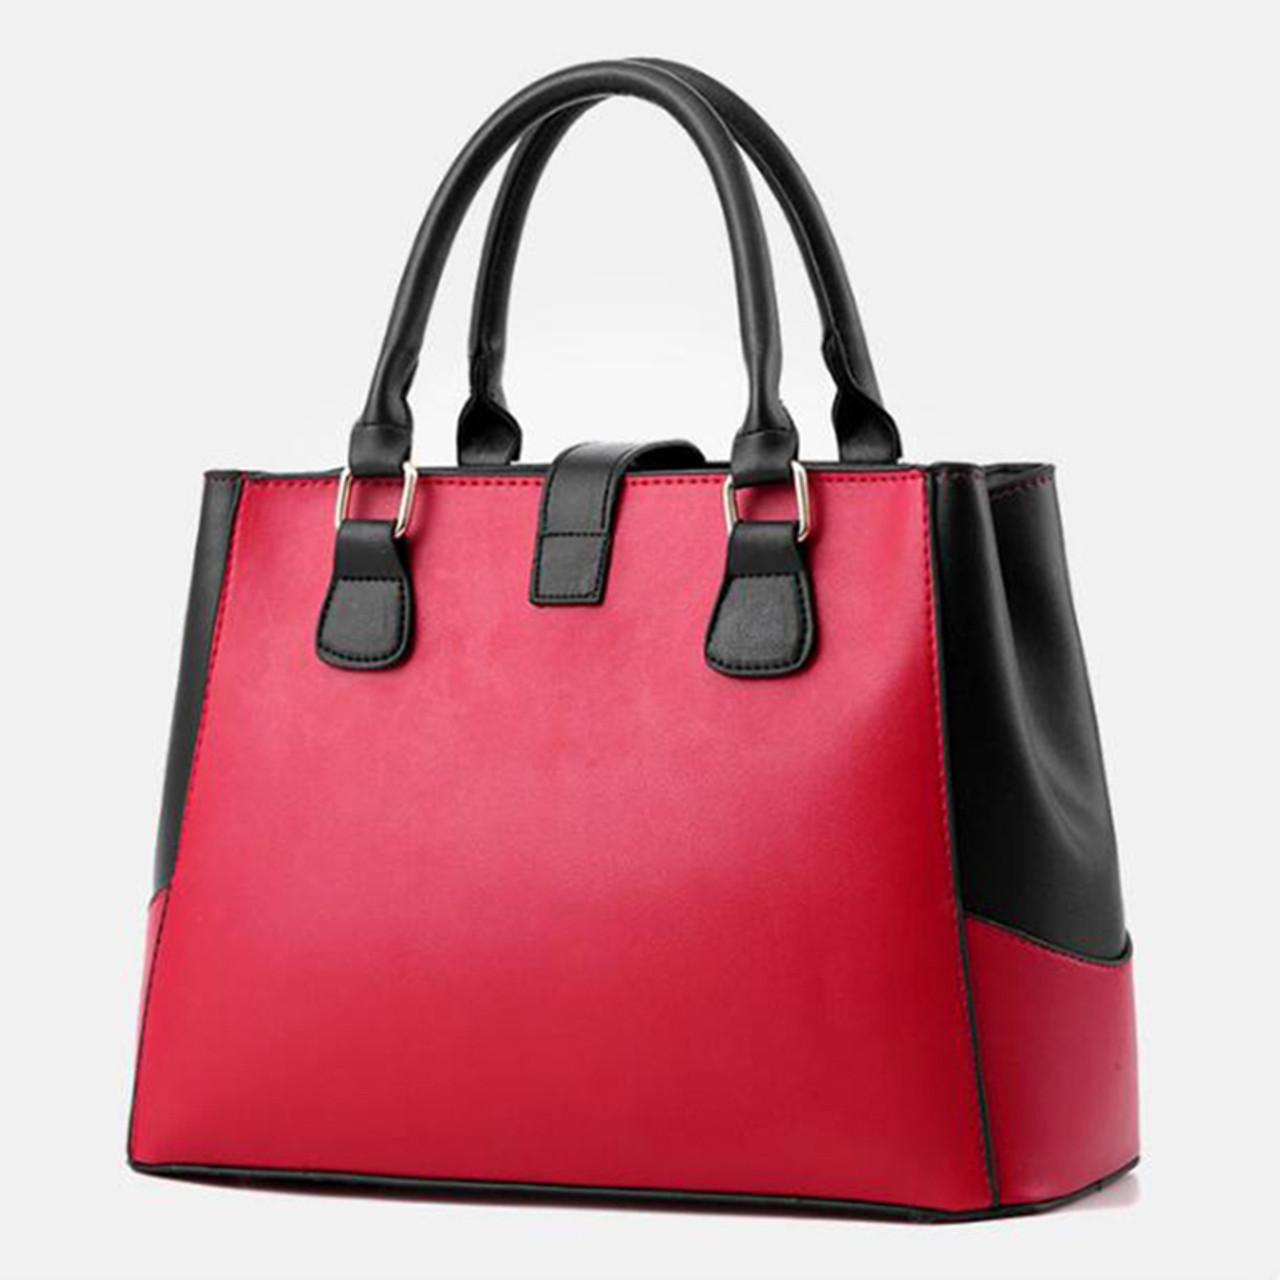 19e72f7cb31 ... 2018 Sweet Handbags for Women New Fashion Designer PU Leather Shoulder  Bags Female Top-Handle ...